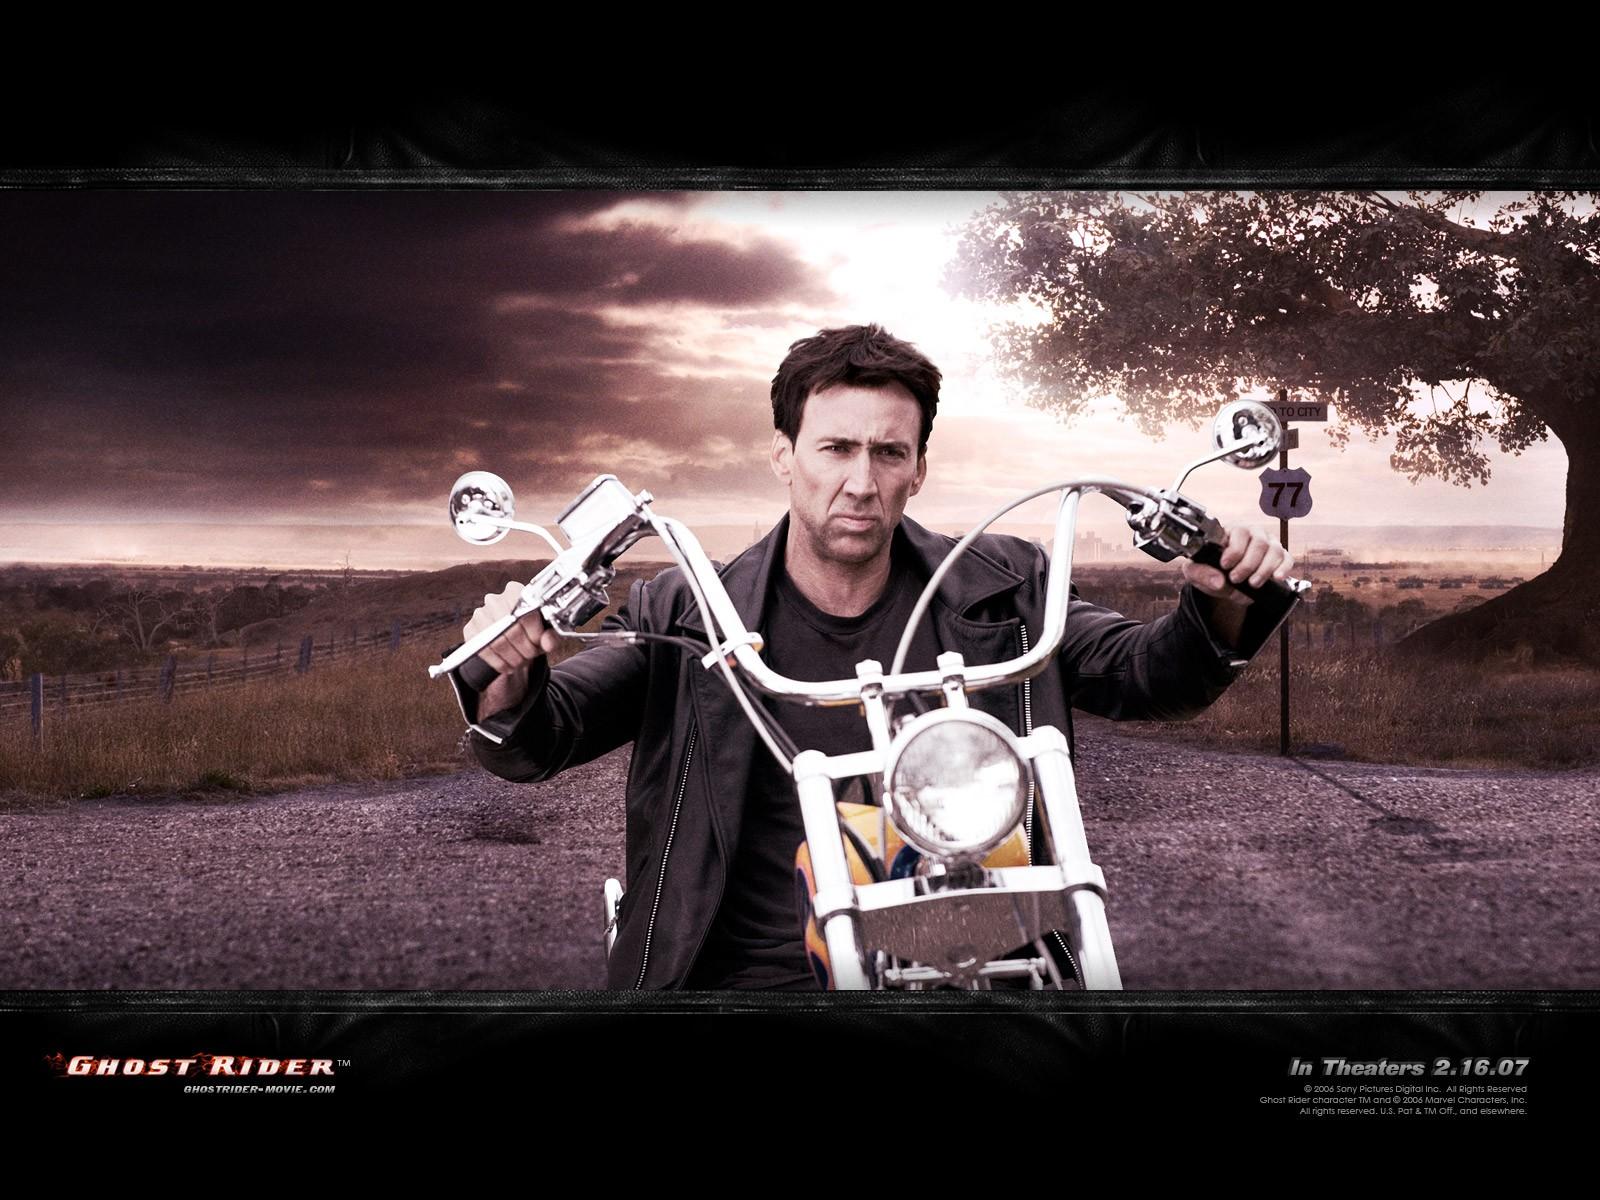 Movie Wallpapers Ghost Rider Berita Harian Online